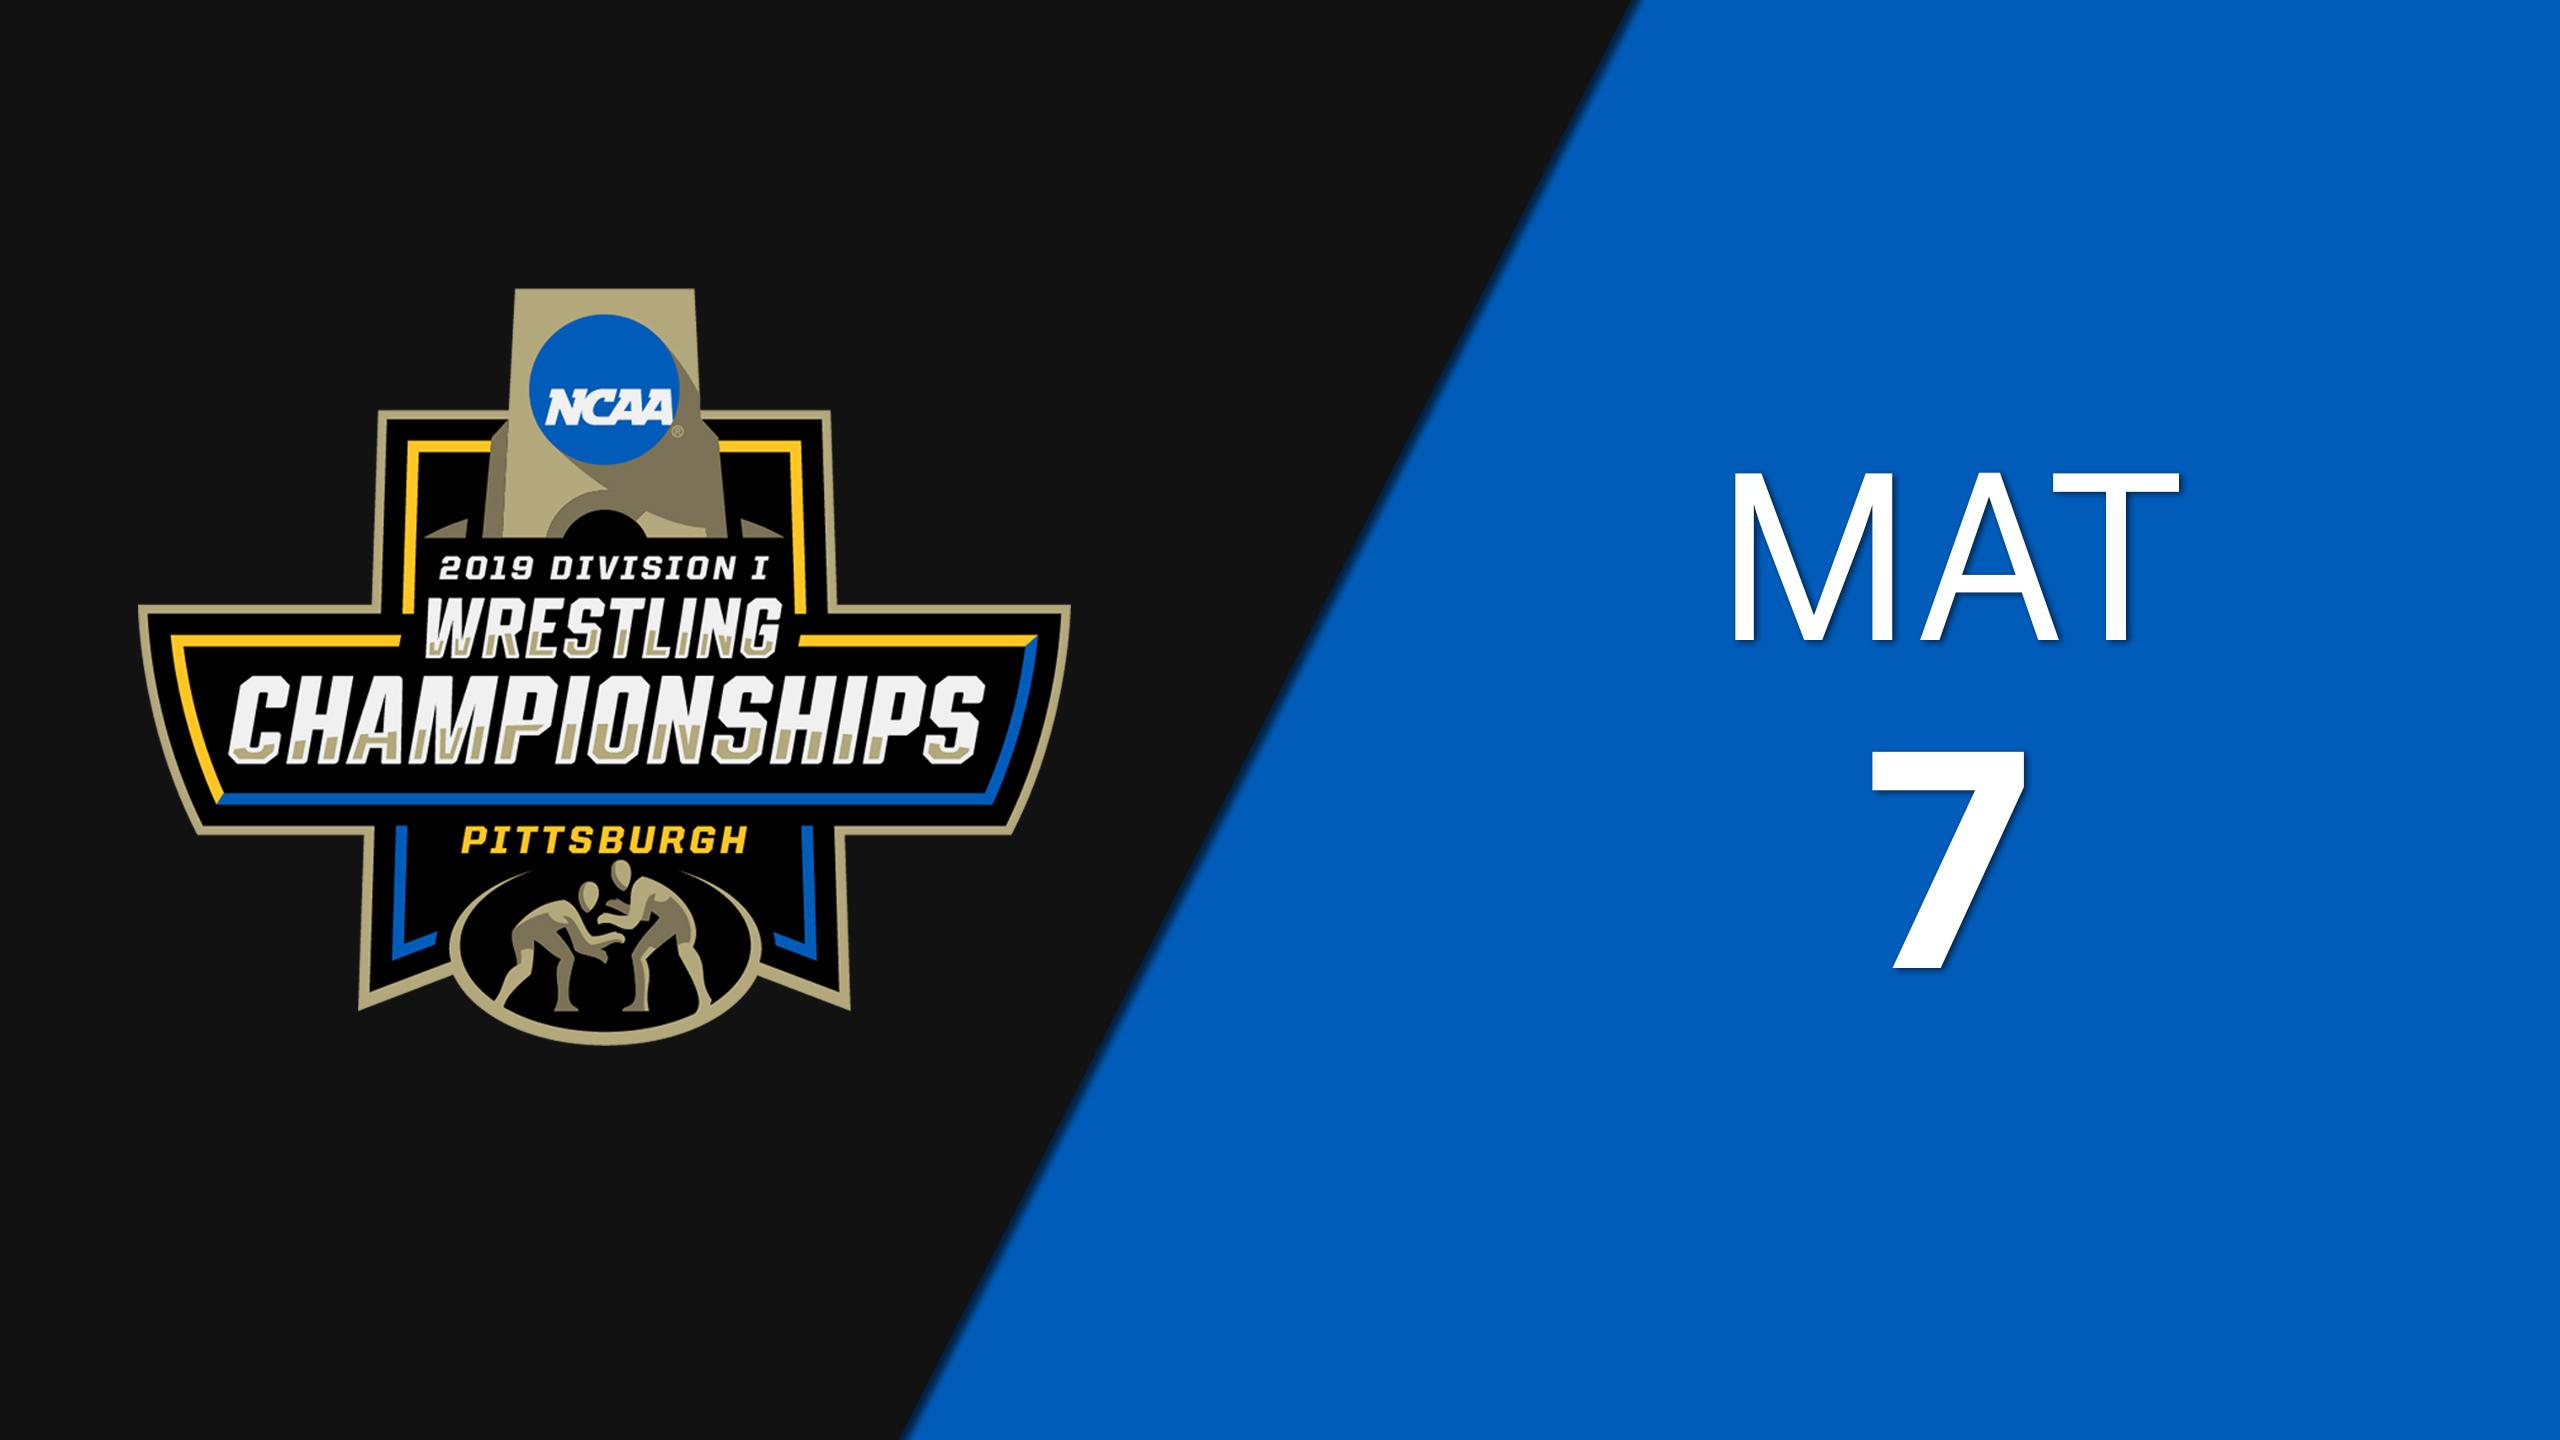 NCAA Wrestling Championship (Mat 7, Second Round)